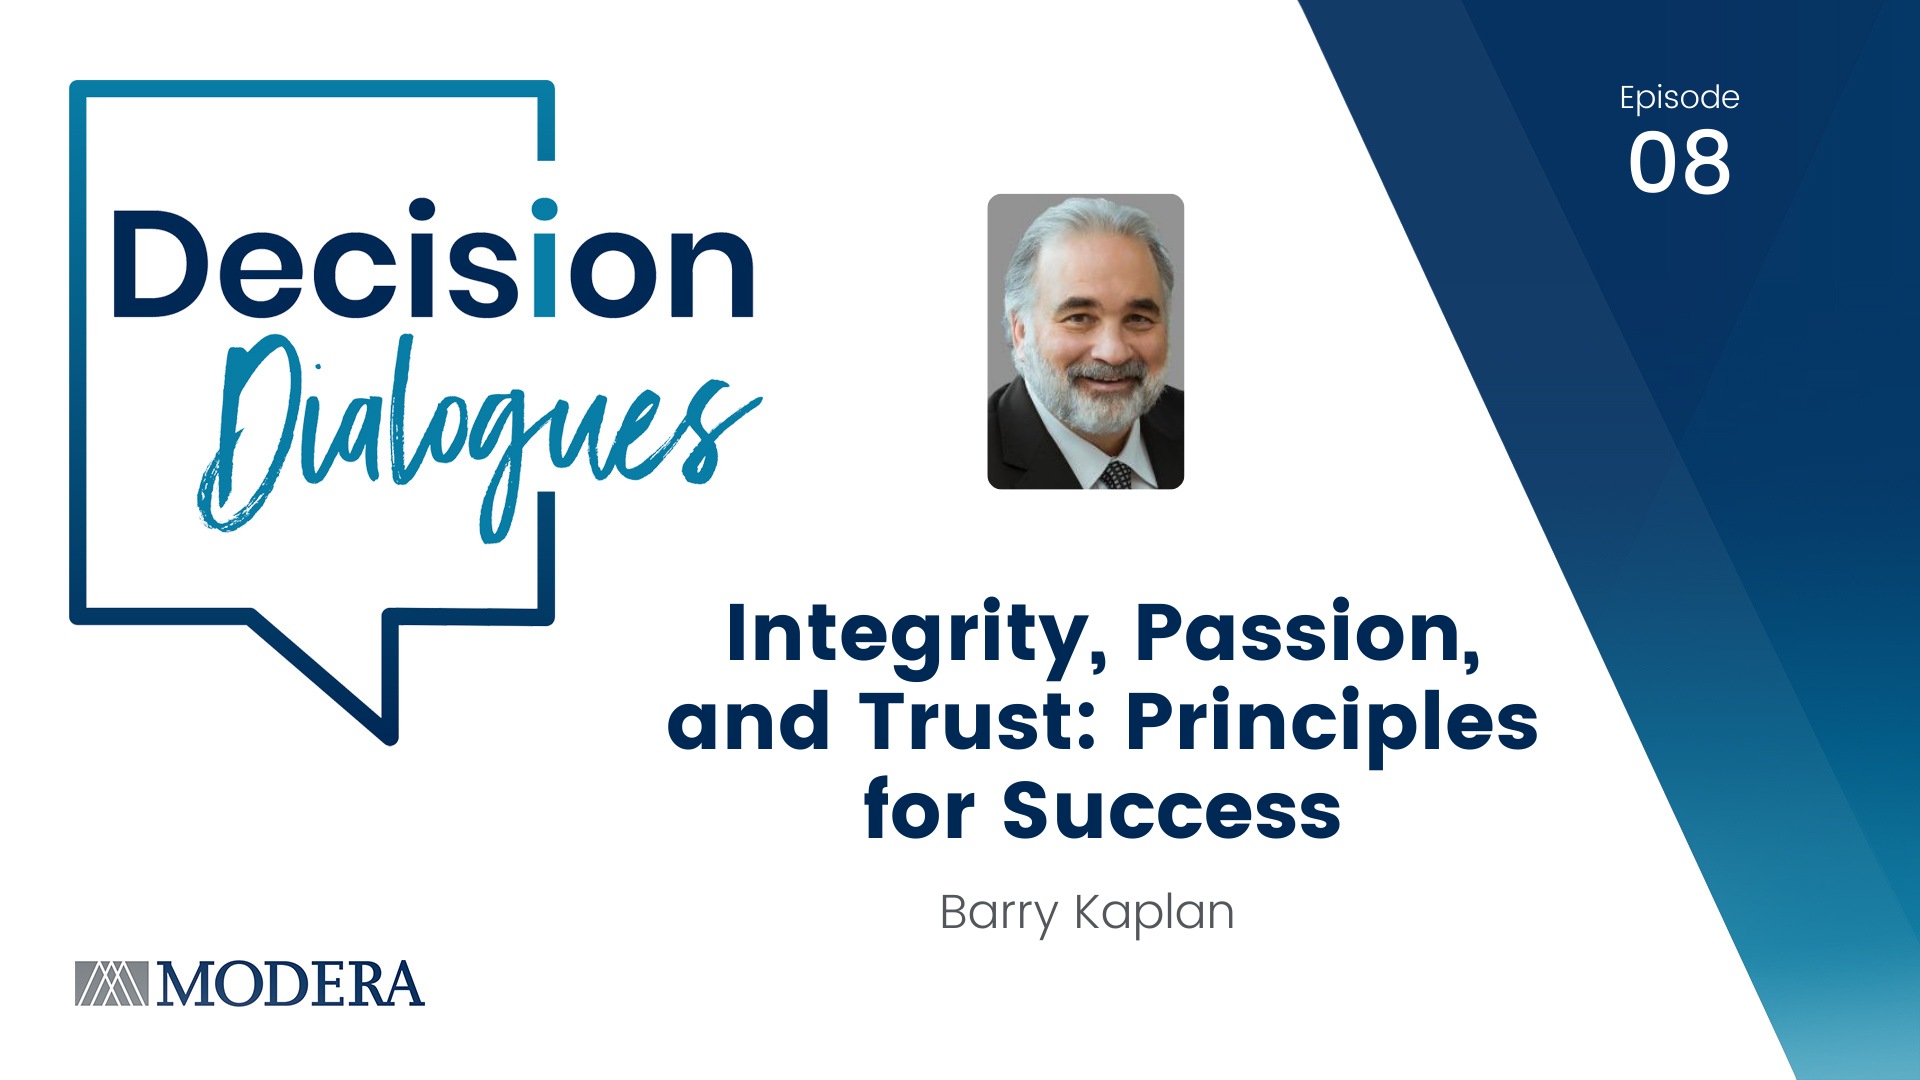 Decision Dialogues Episode 8: Barry Kaplan